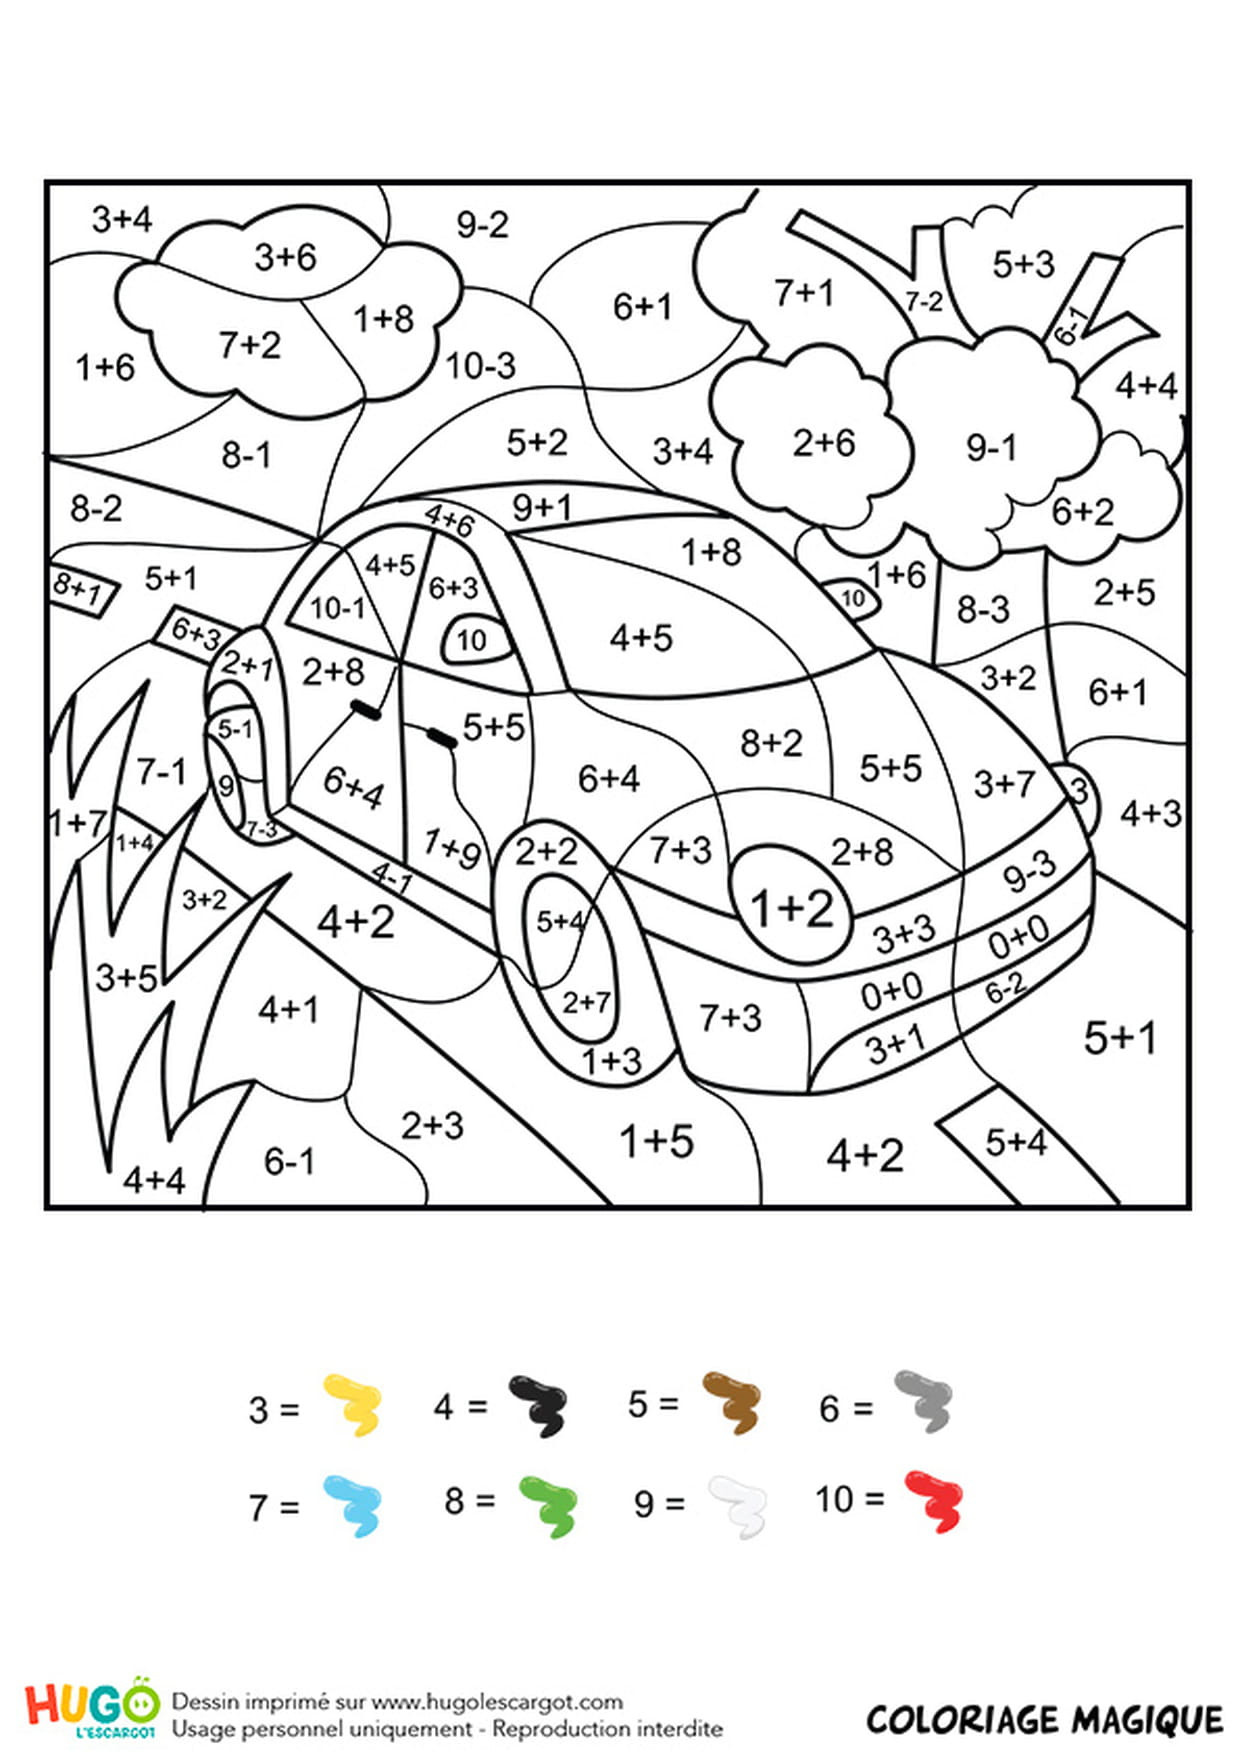 Coloriage Vehicule - Greatestcoloringbook avec Voiture Int?Rieur Coloriage